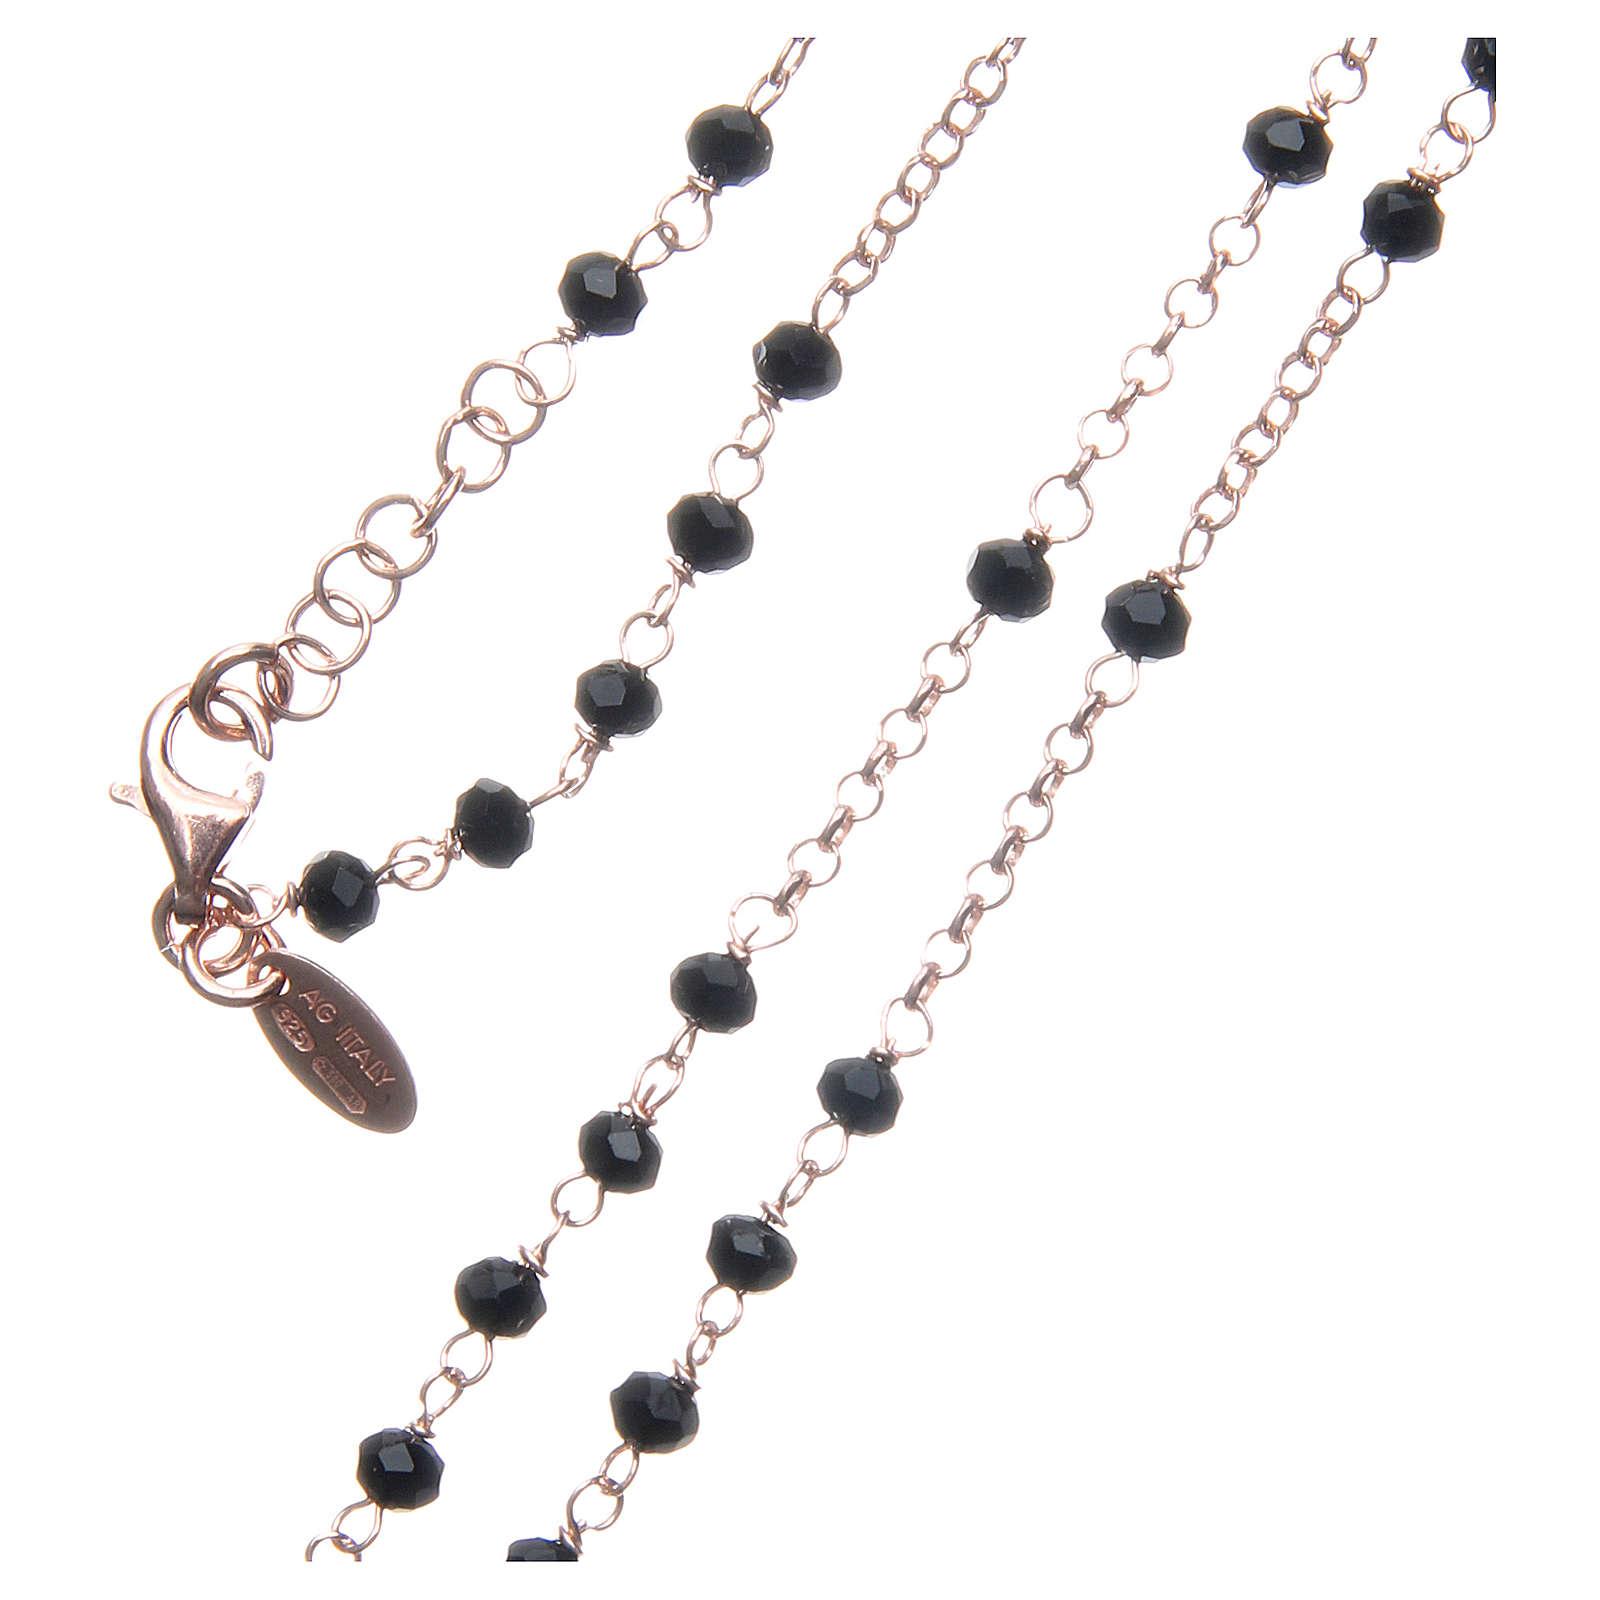 Naszyjnik różaniec AMEN klasyczny kryształy czarne srebro 925 rose' 4